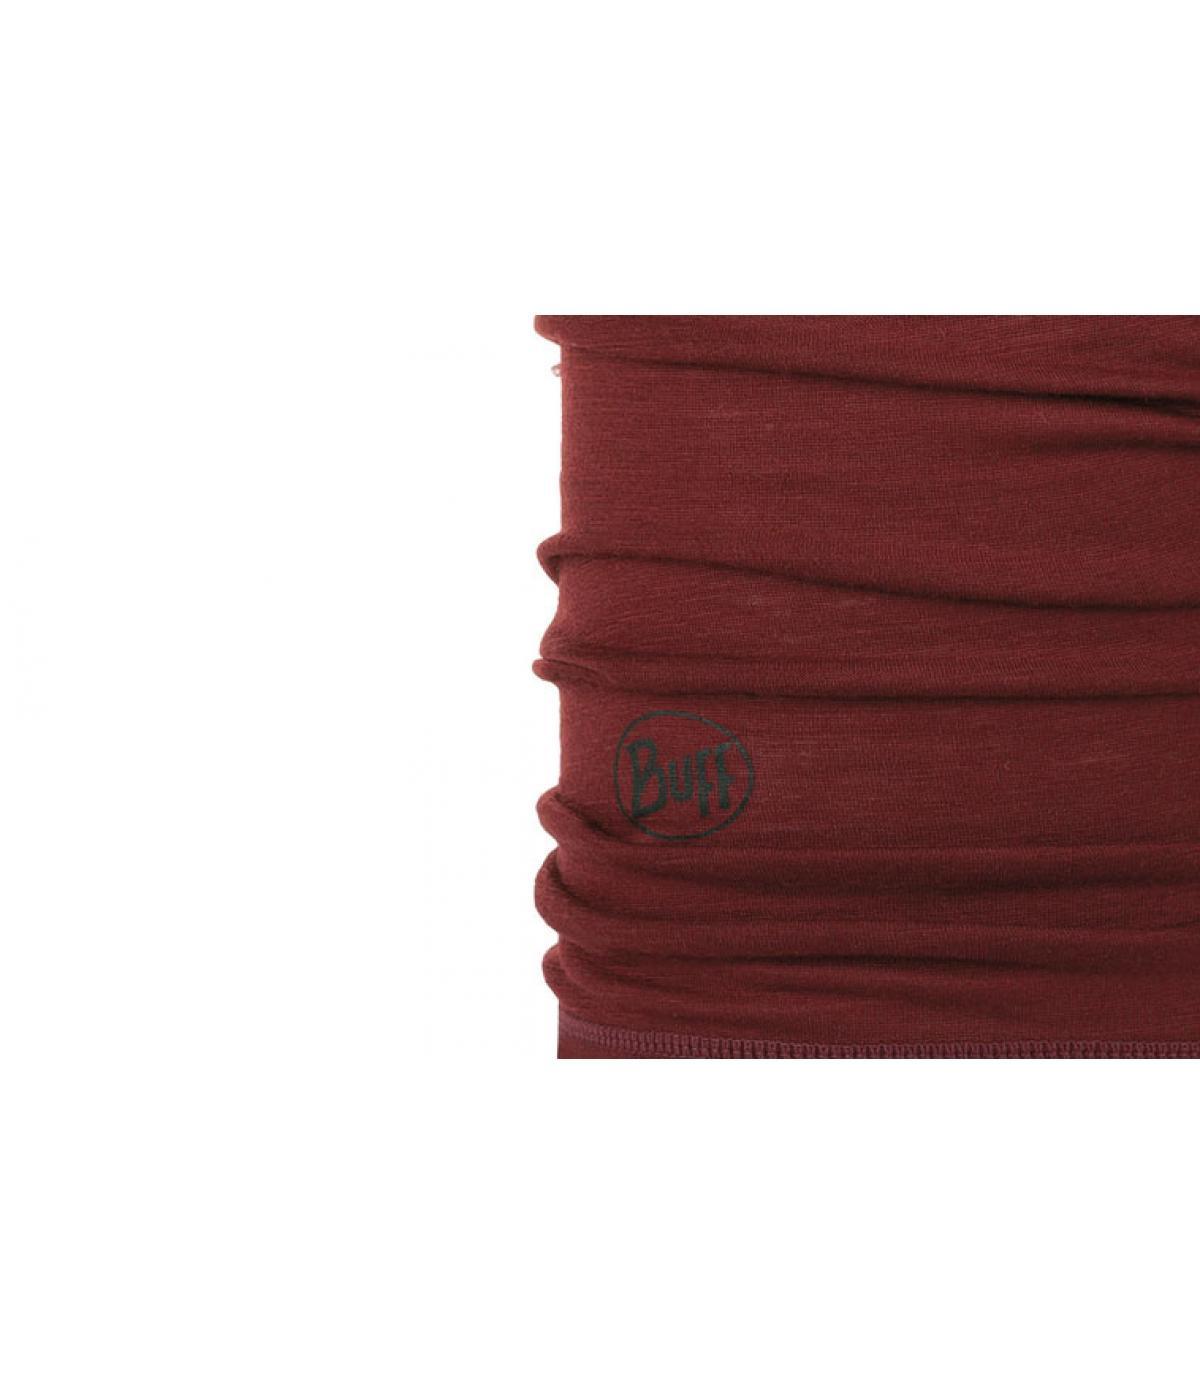 Details Lightweight Merino Wool solid wine - Abbildung 2